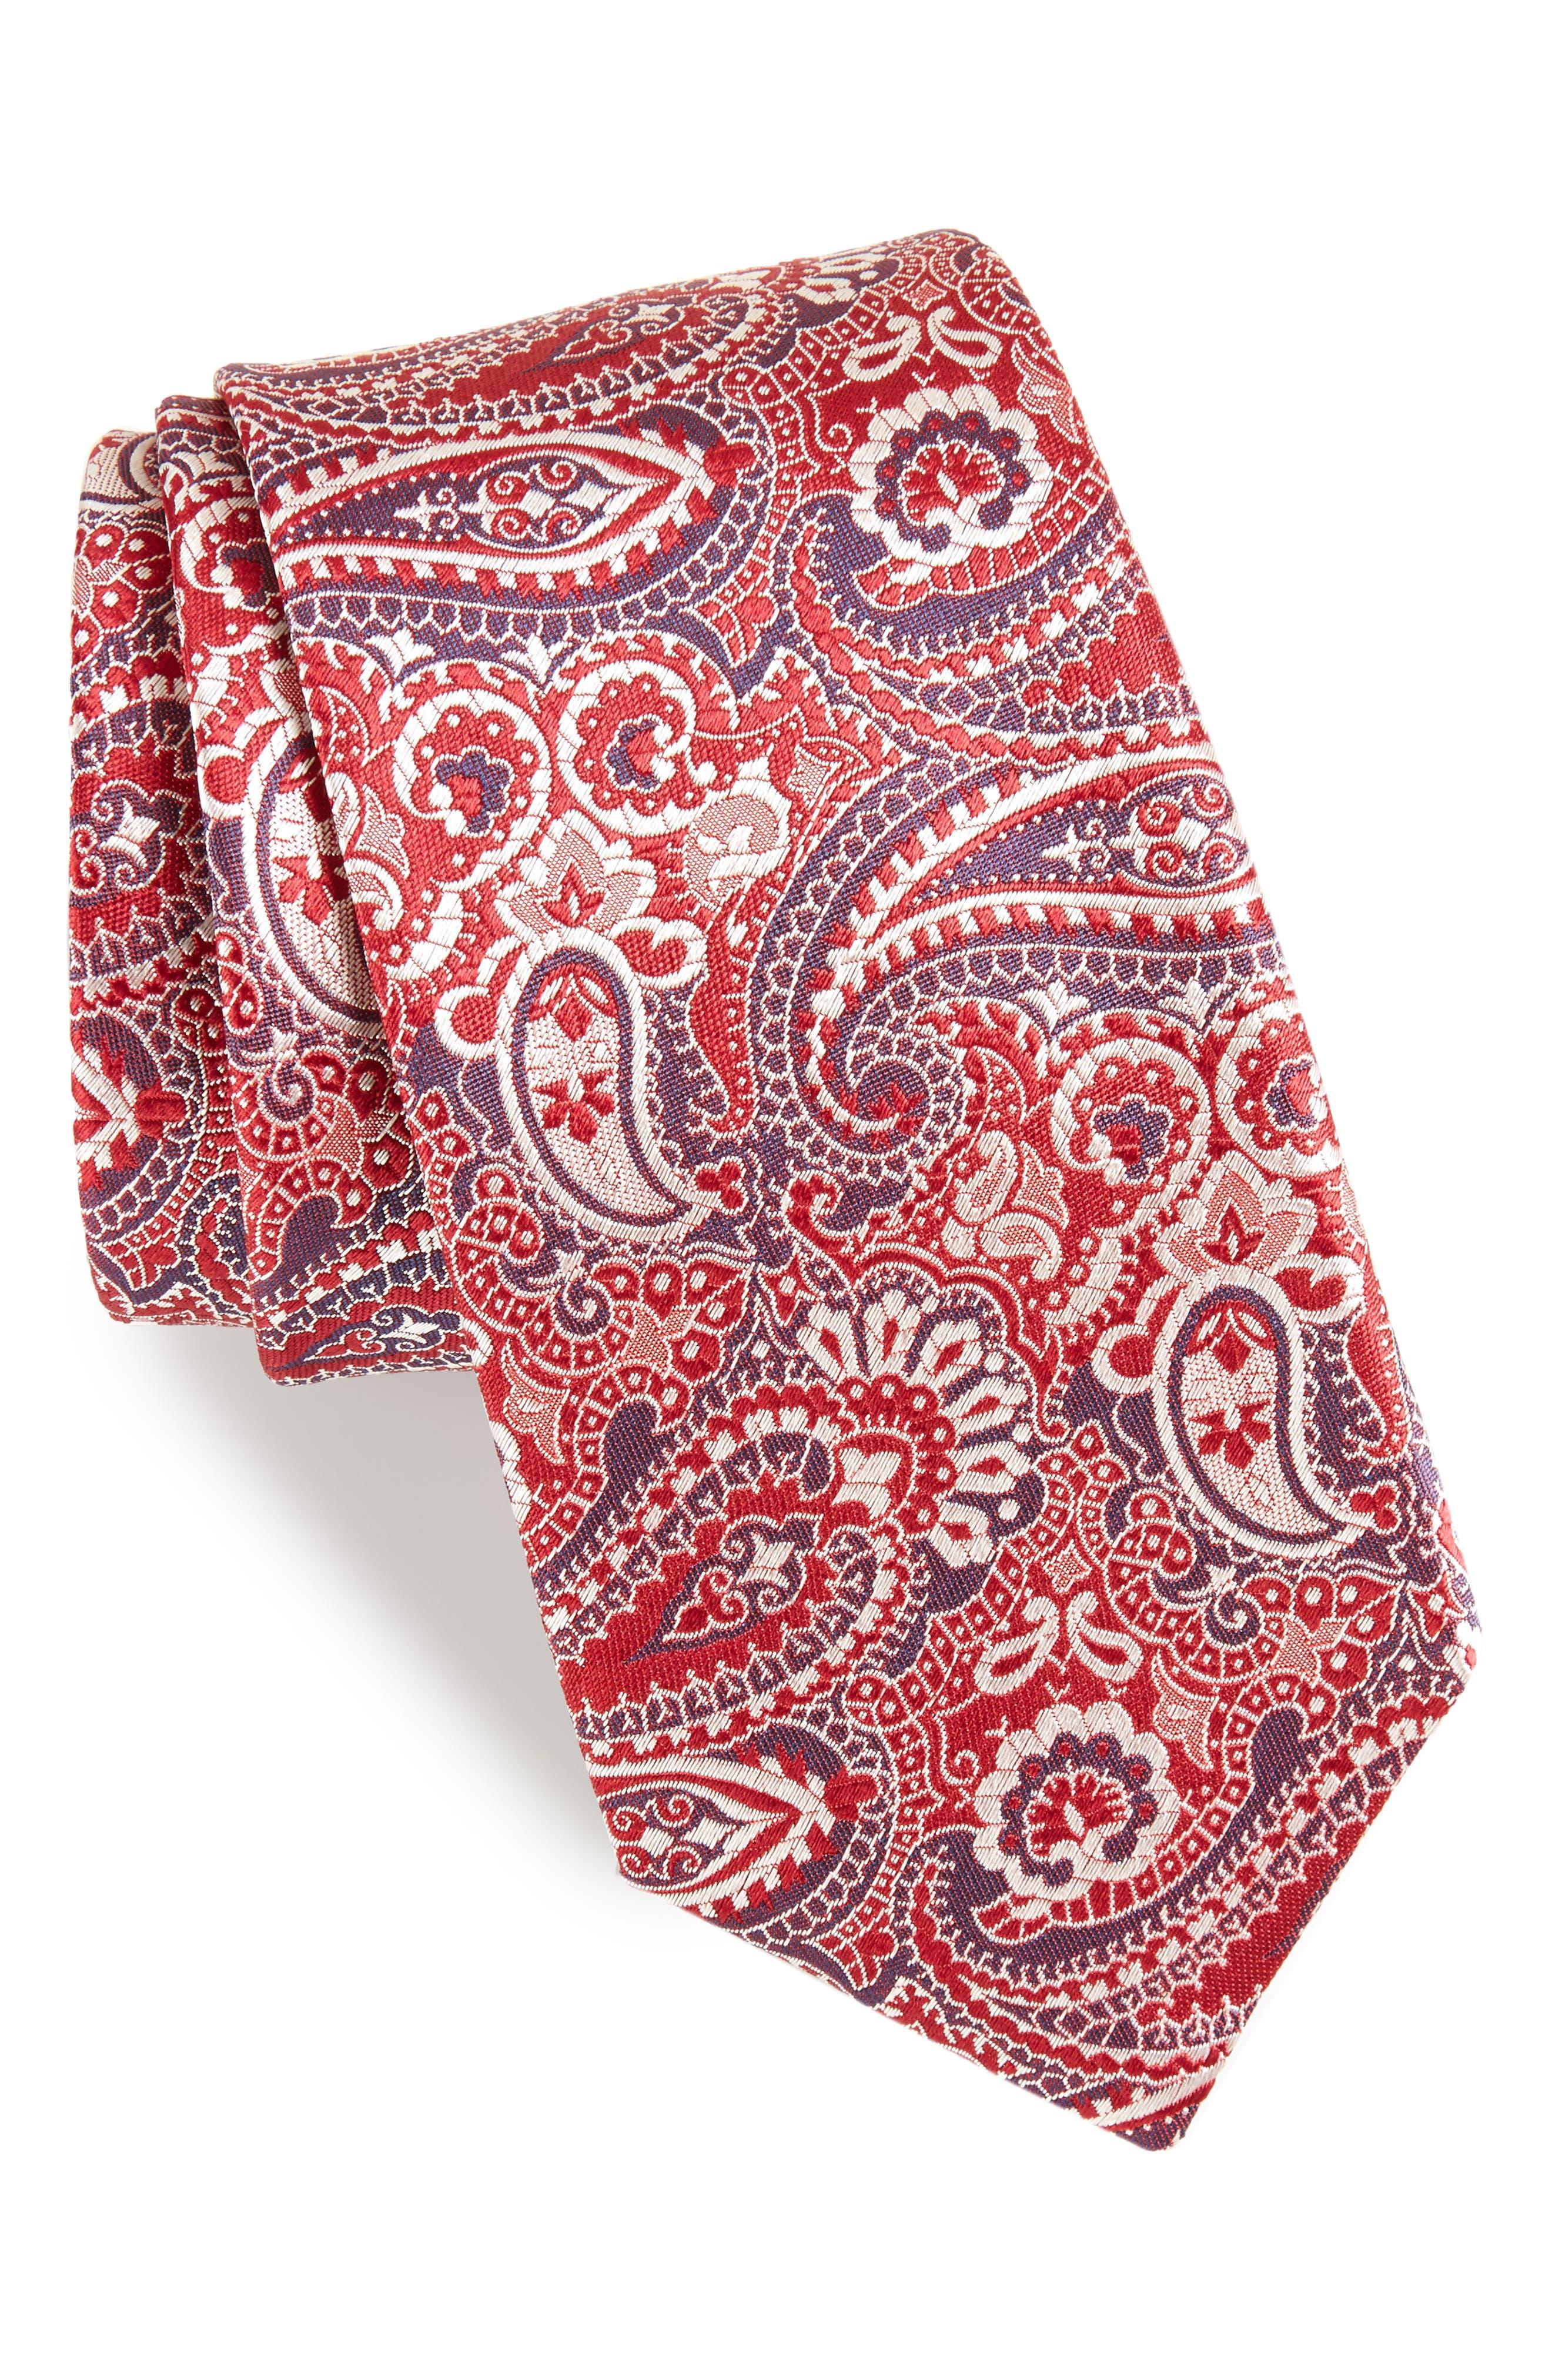 Alternate Image 1 Selected - BOSS Paisley Silk Tie